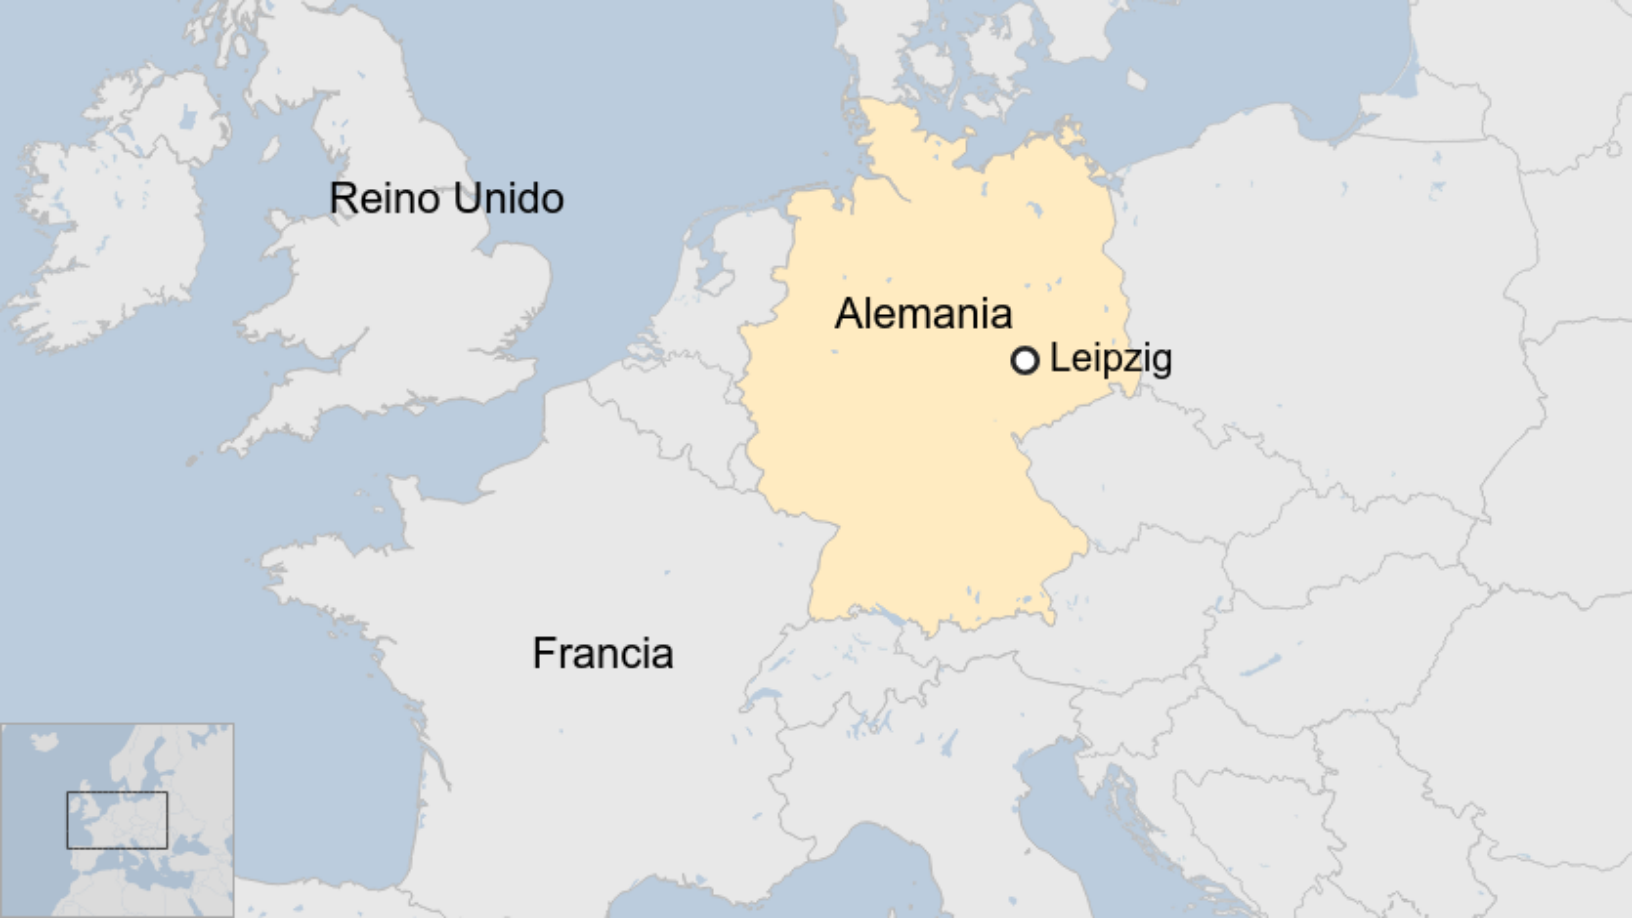 Map: Leipzig, Alemania